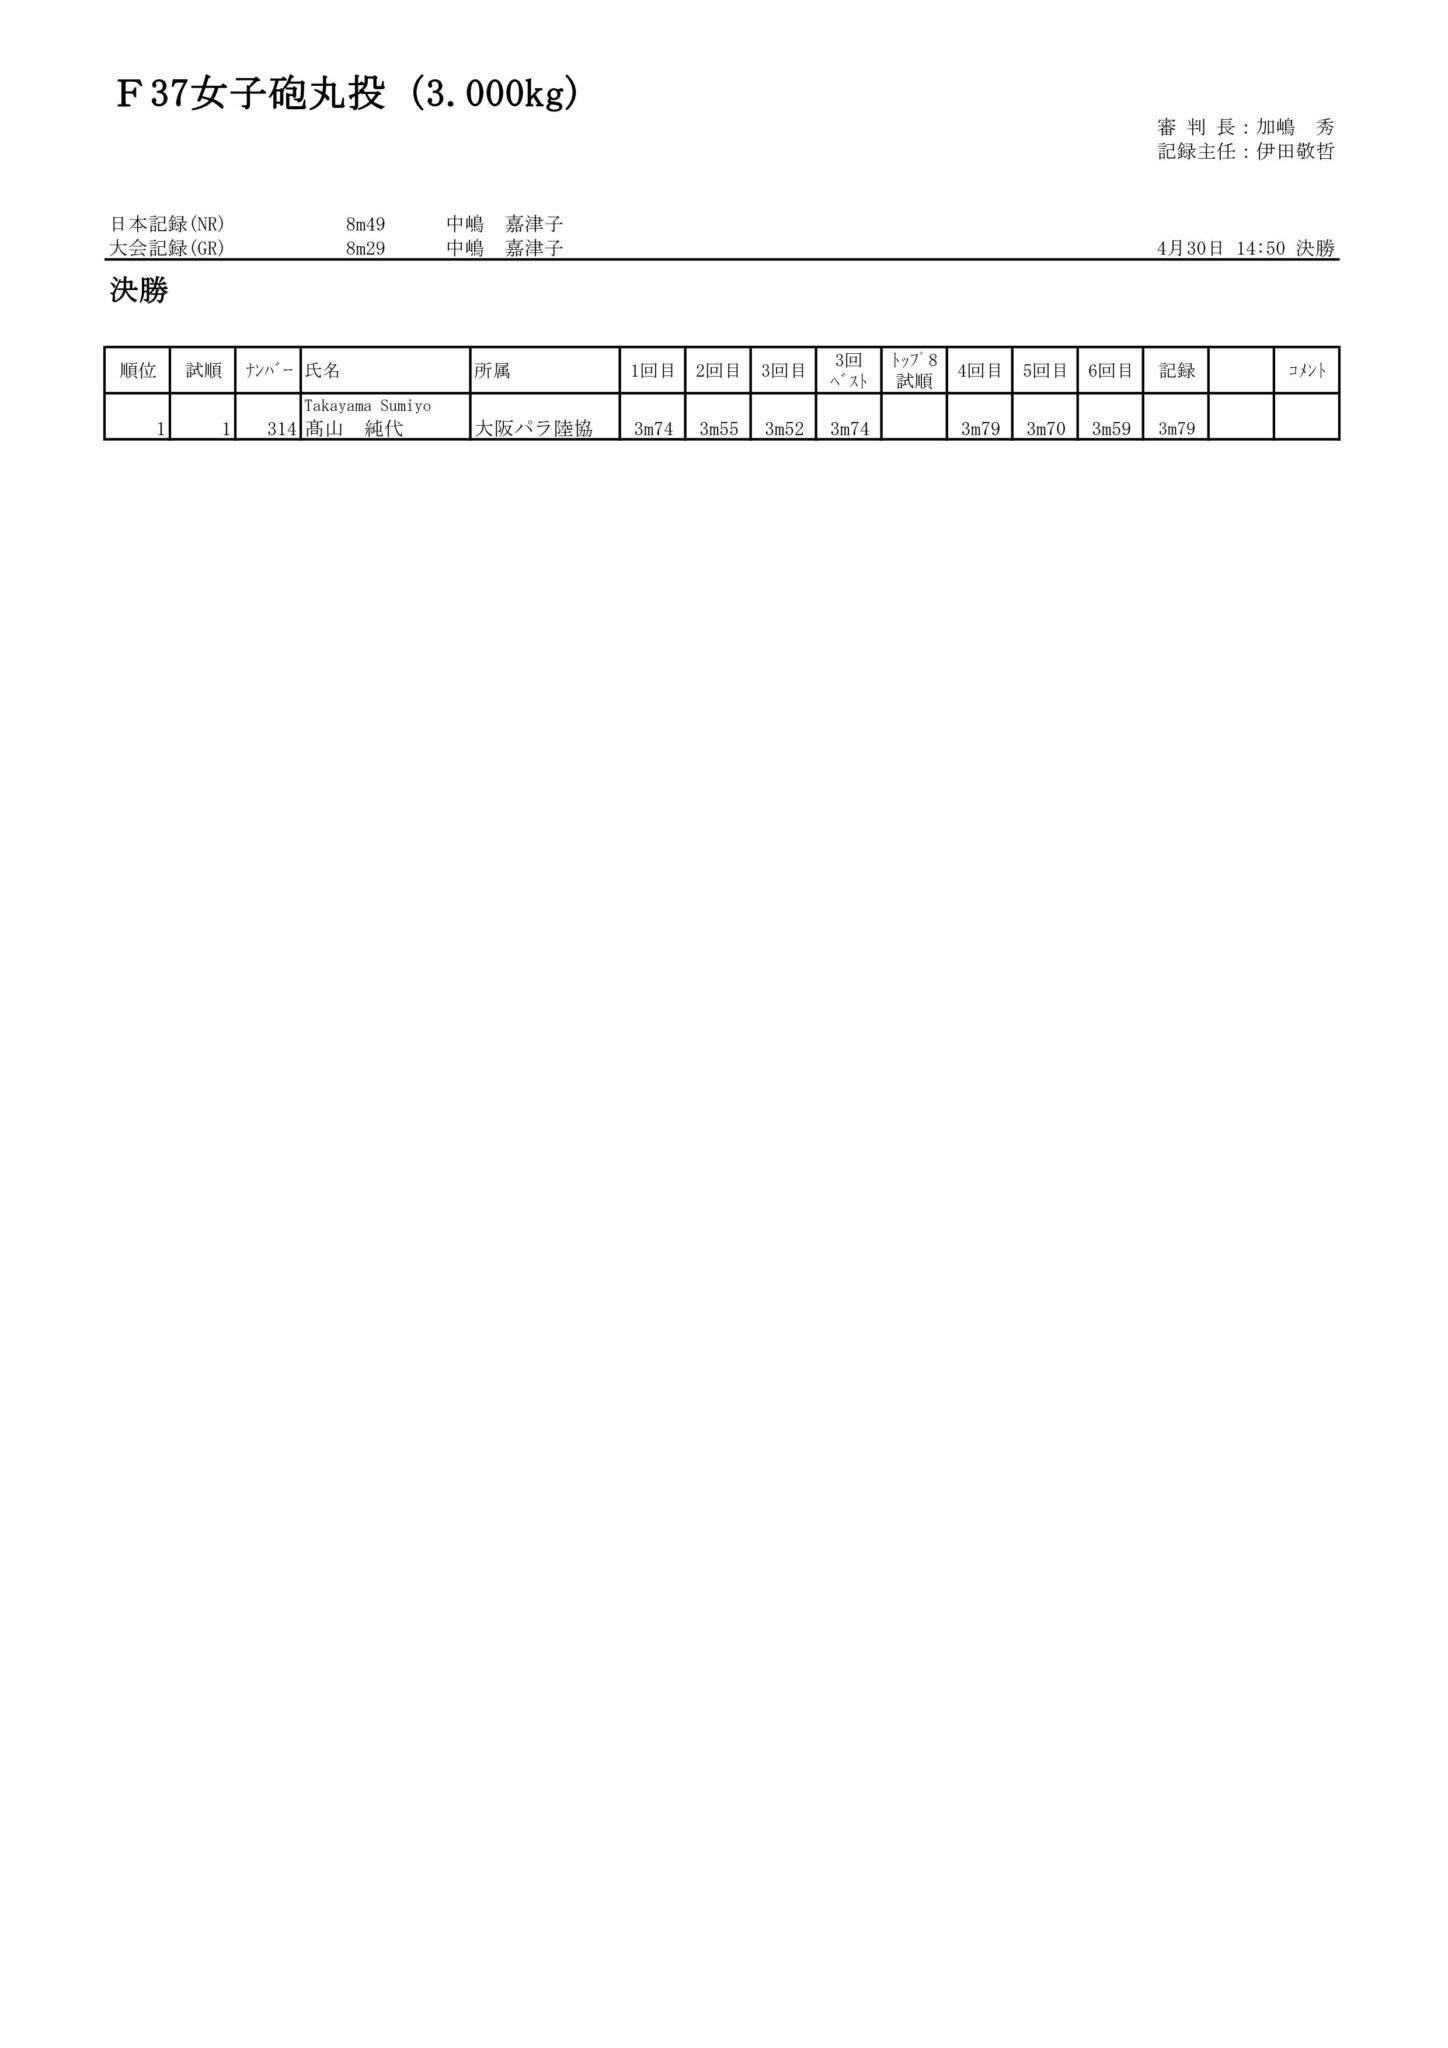 109F37女子砲丸投(3.000kg)_01